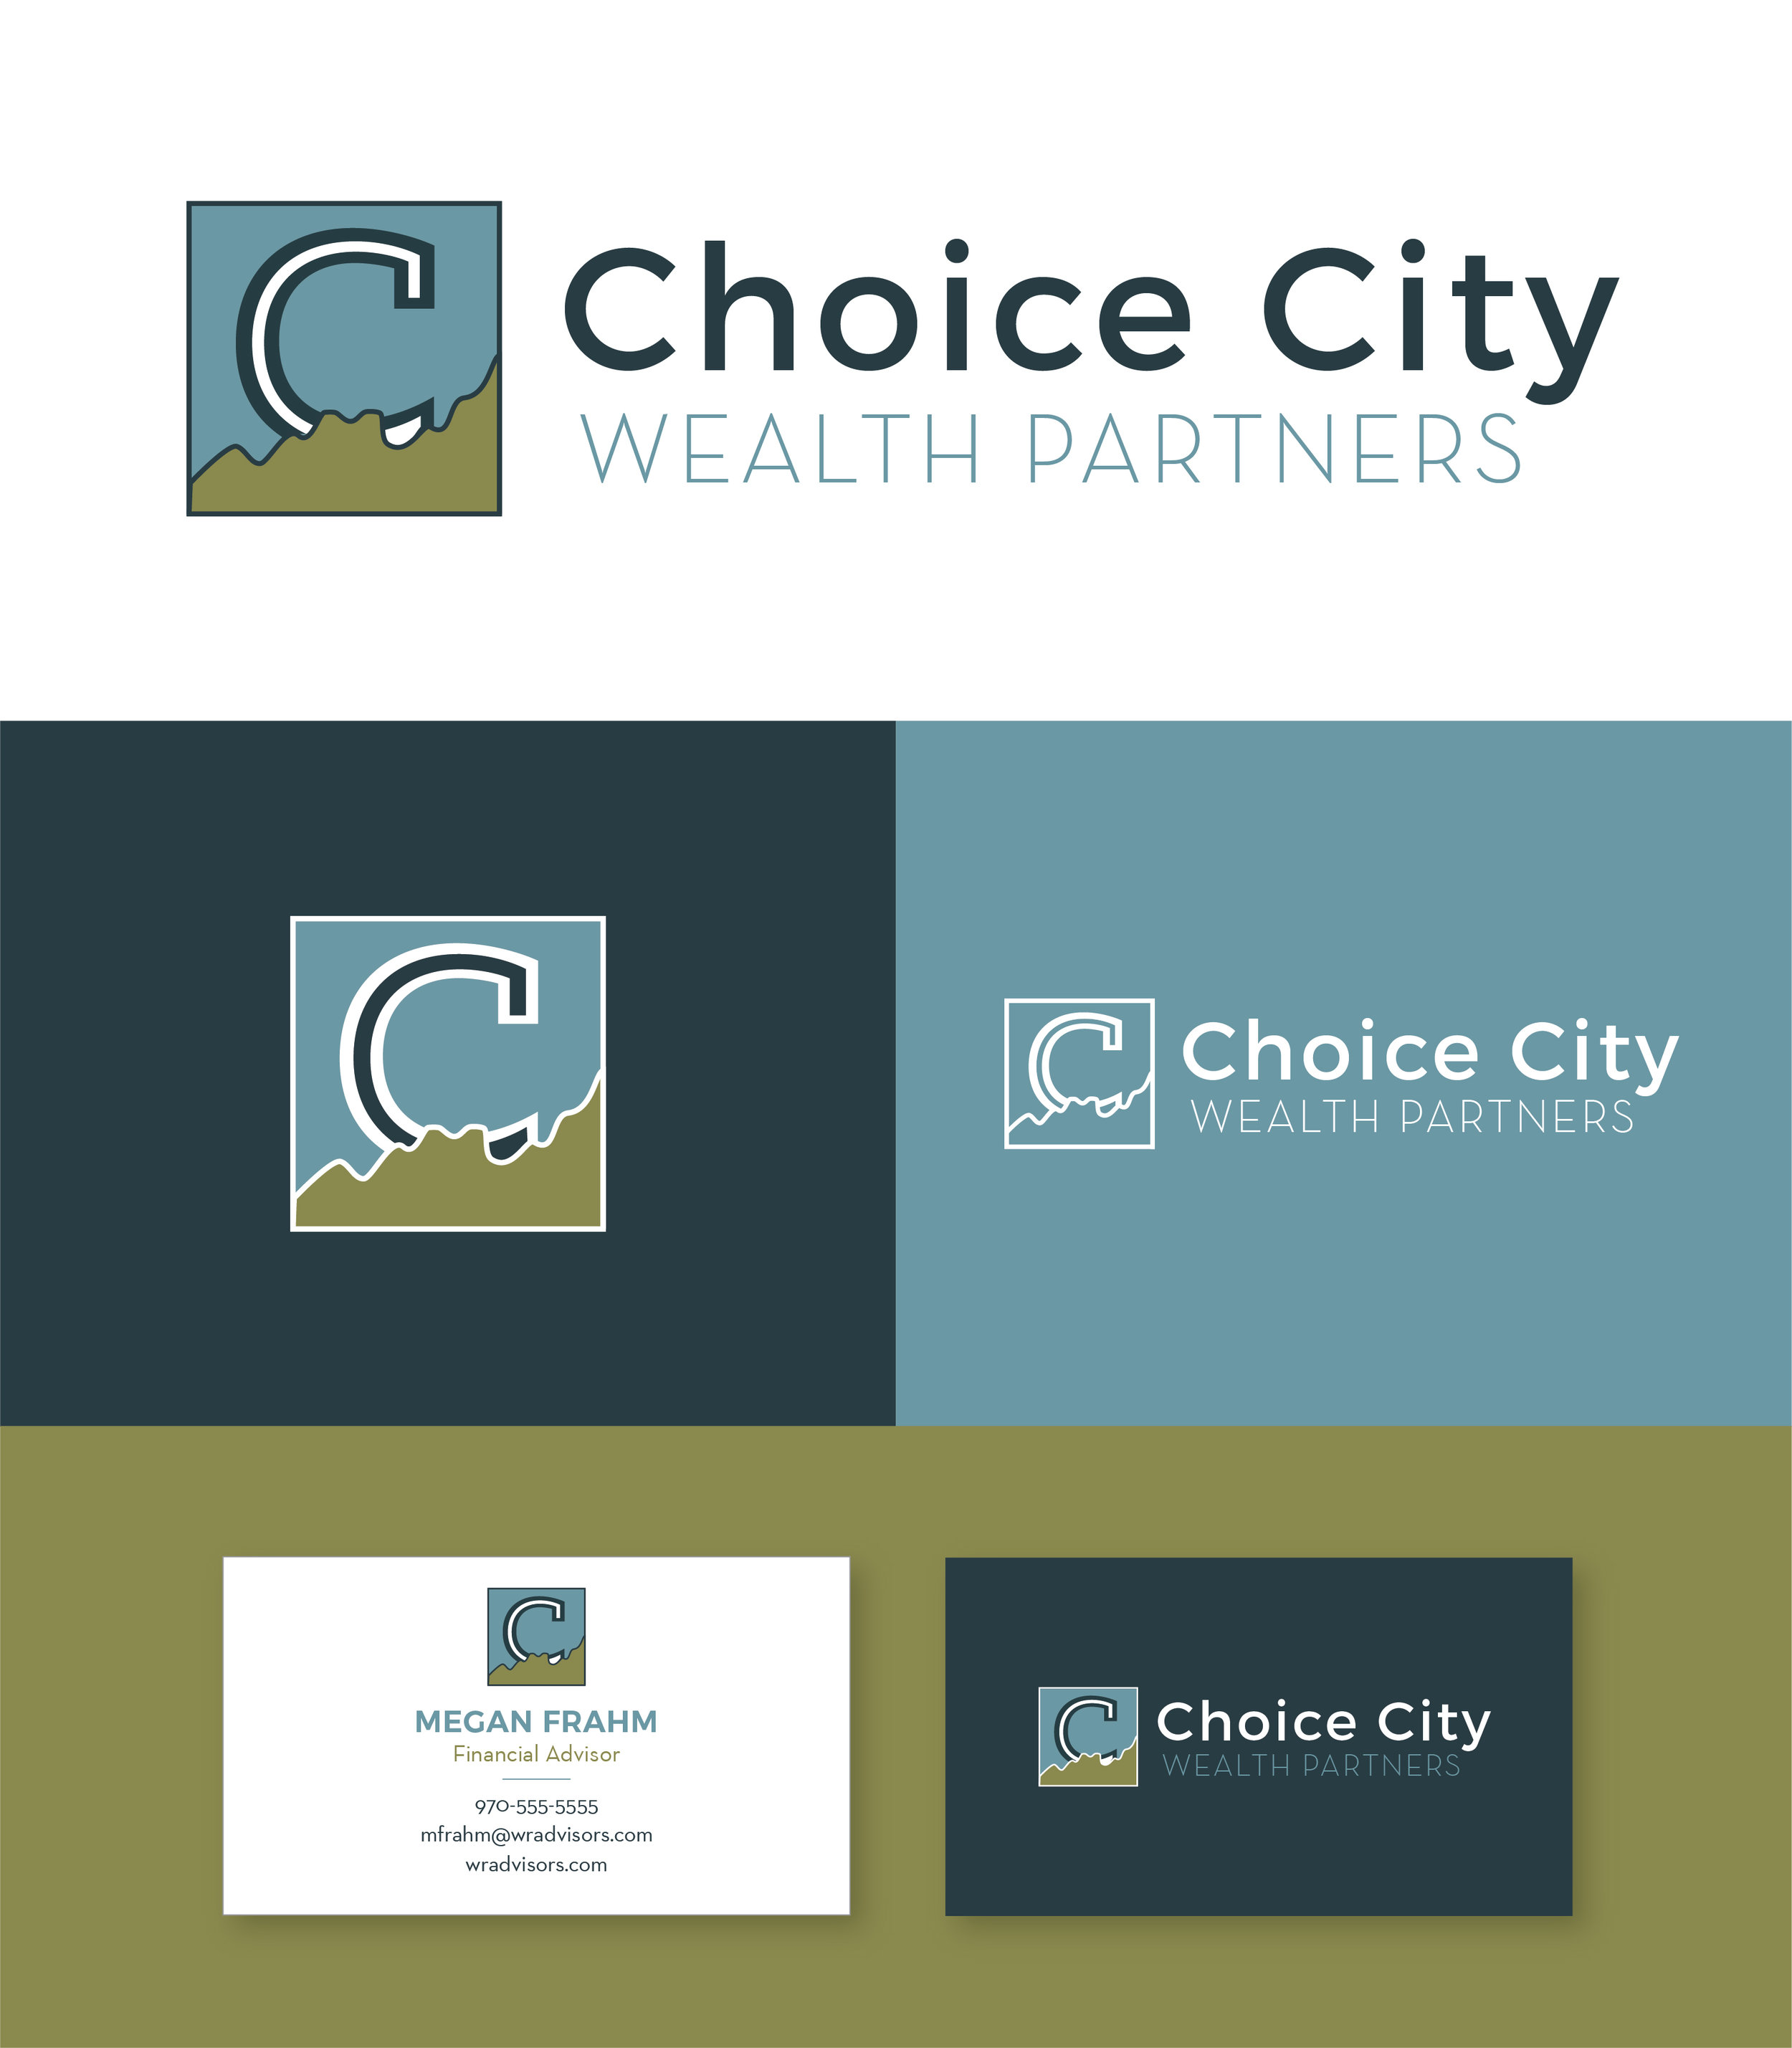 ChoiceCIty_FirstLook-02.jpg